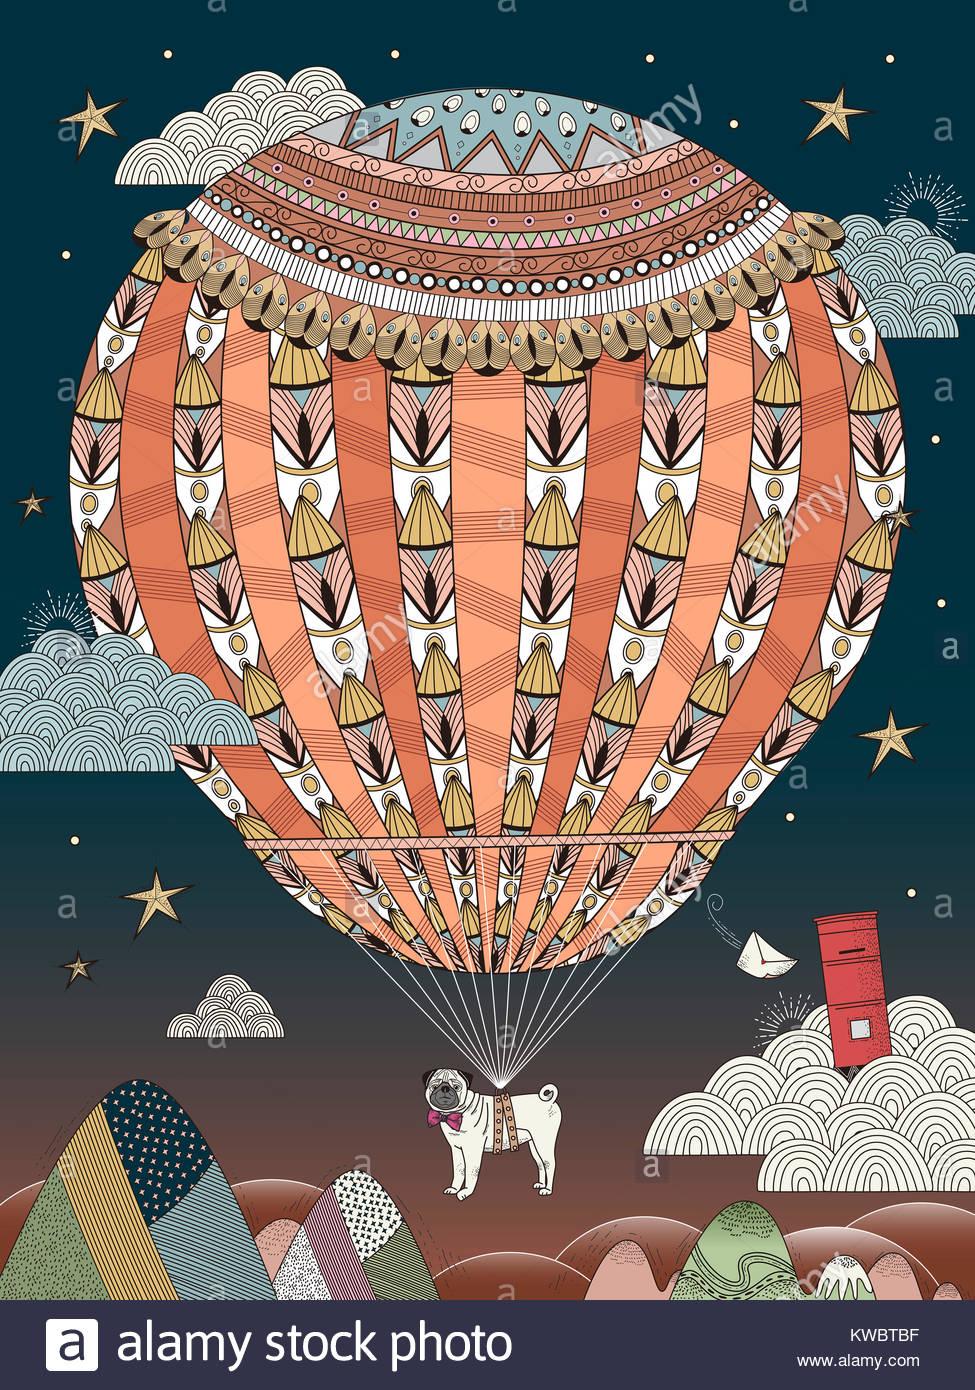 Starry Night Book Stockfotos & Starry Night Book Bilder - Alamy